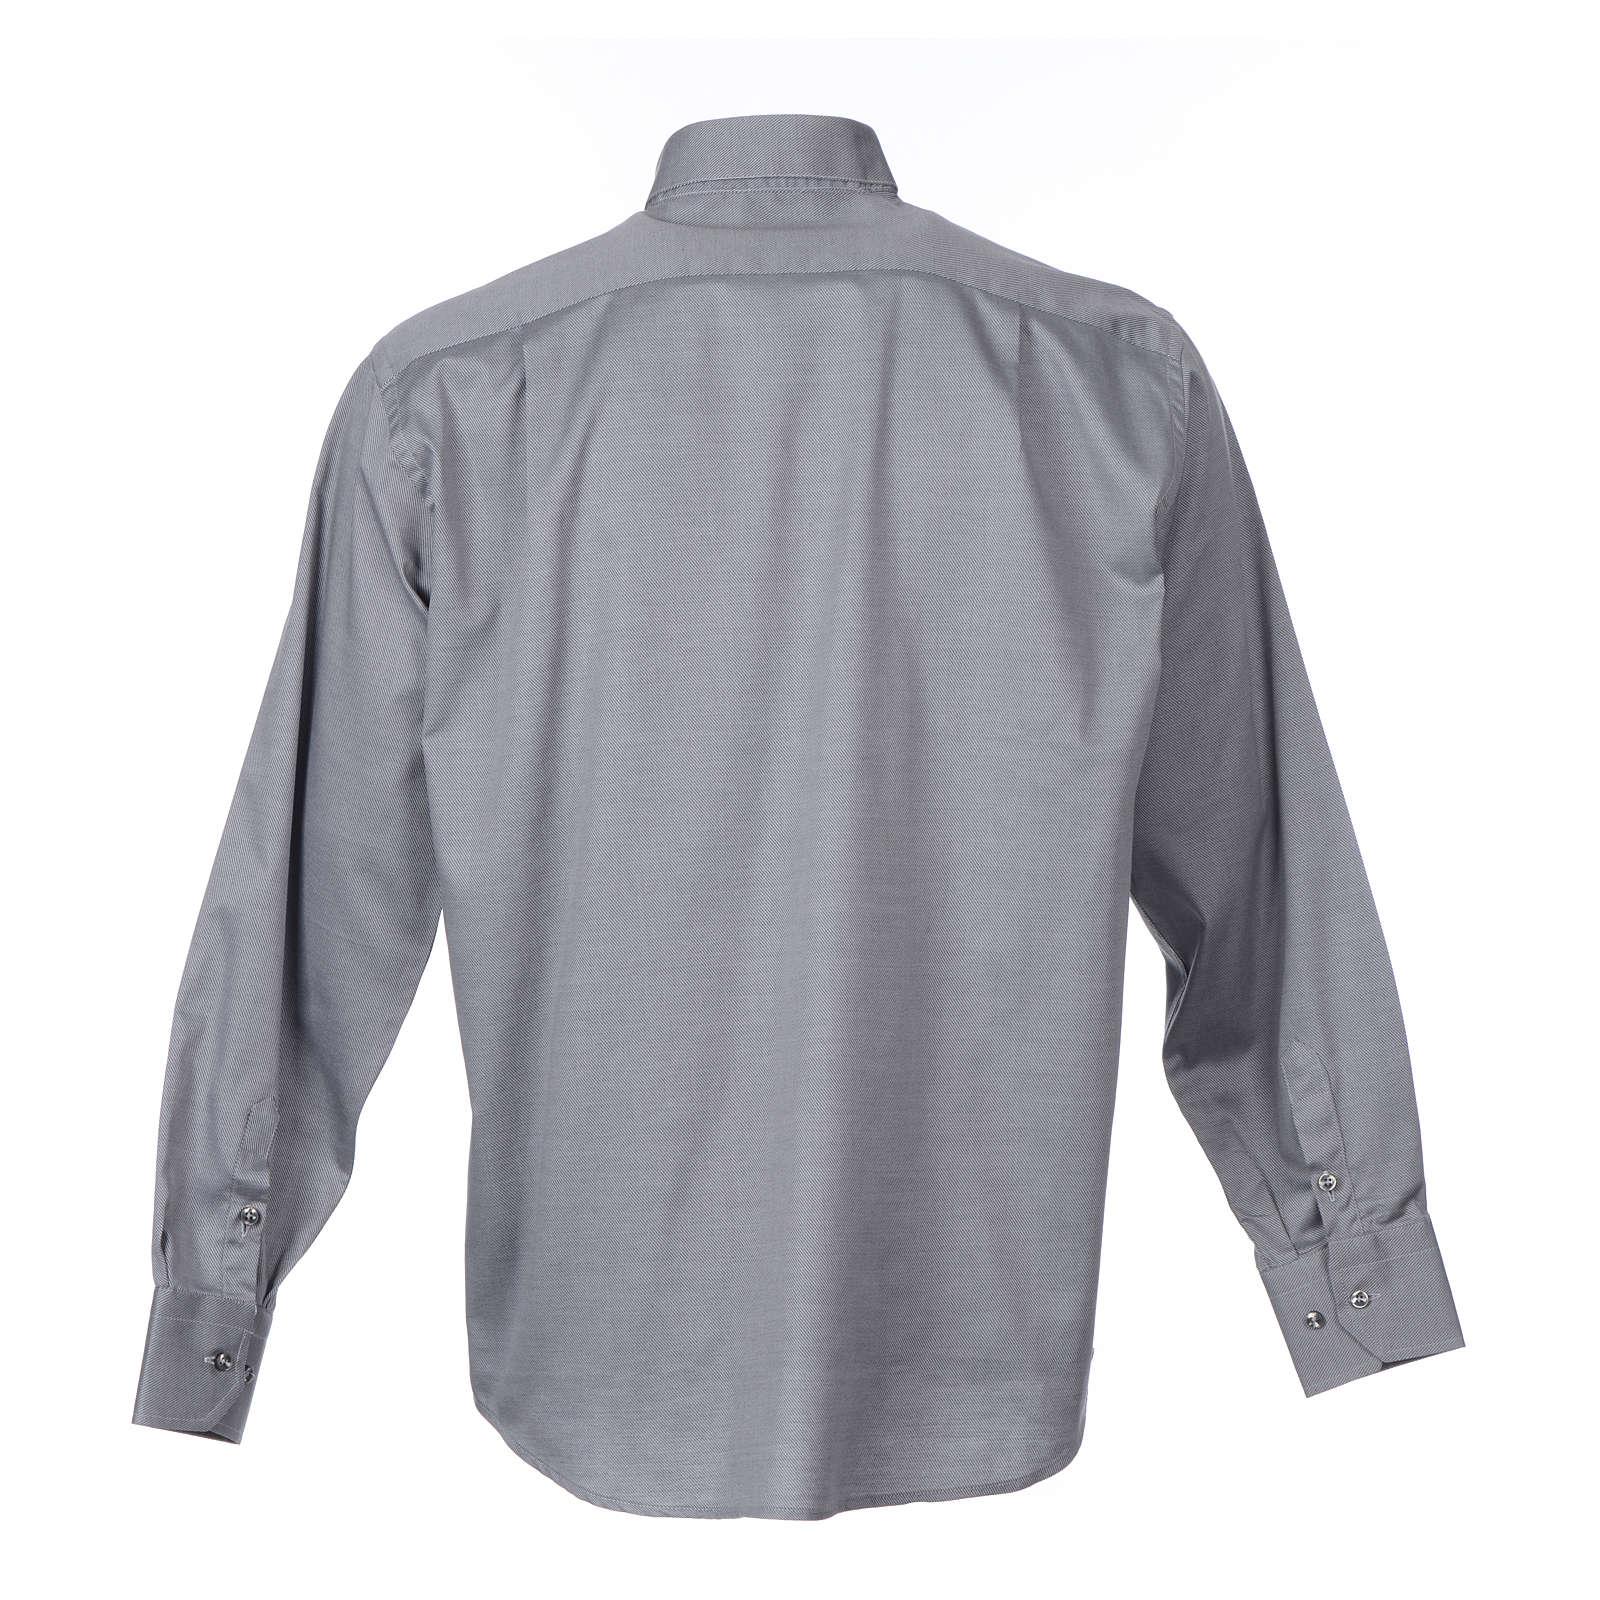 Camisa clergy M/L passo fácil sarja misto algodão cinzento 4